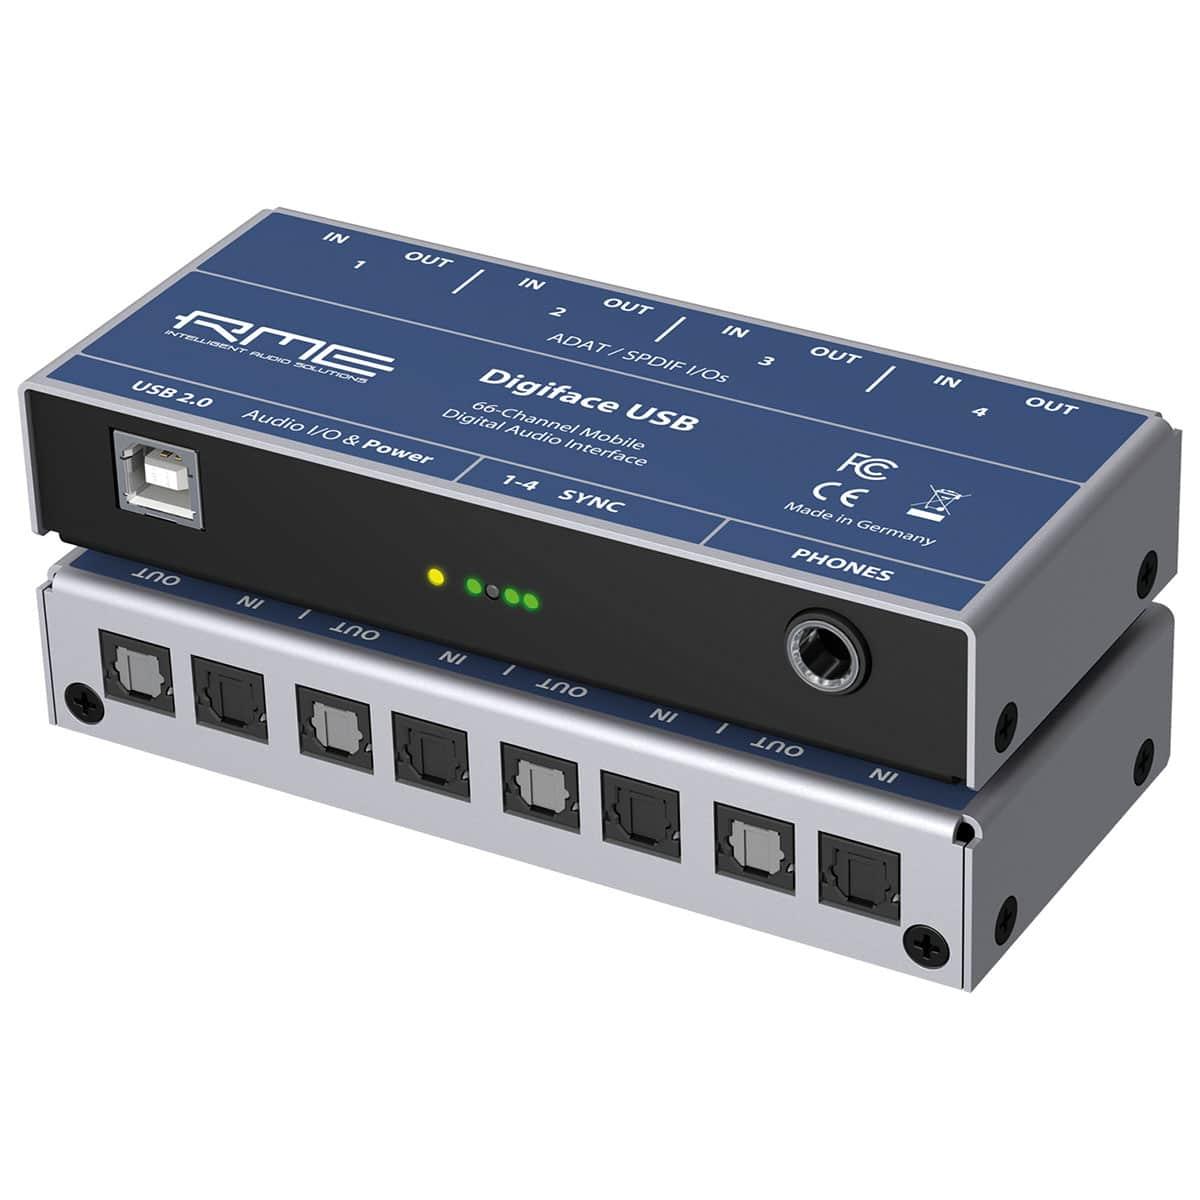 RME Digiface Usb 01 Pro Audio, Audio Digitale Convertitori e Schede Audio, Schede Audio per PC e MAC